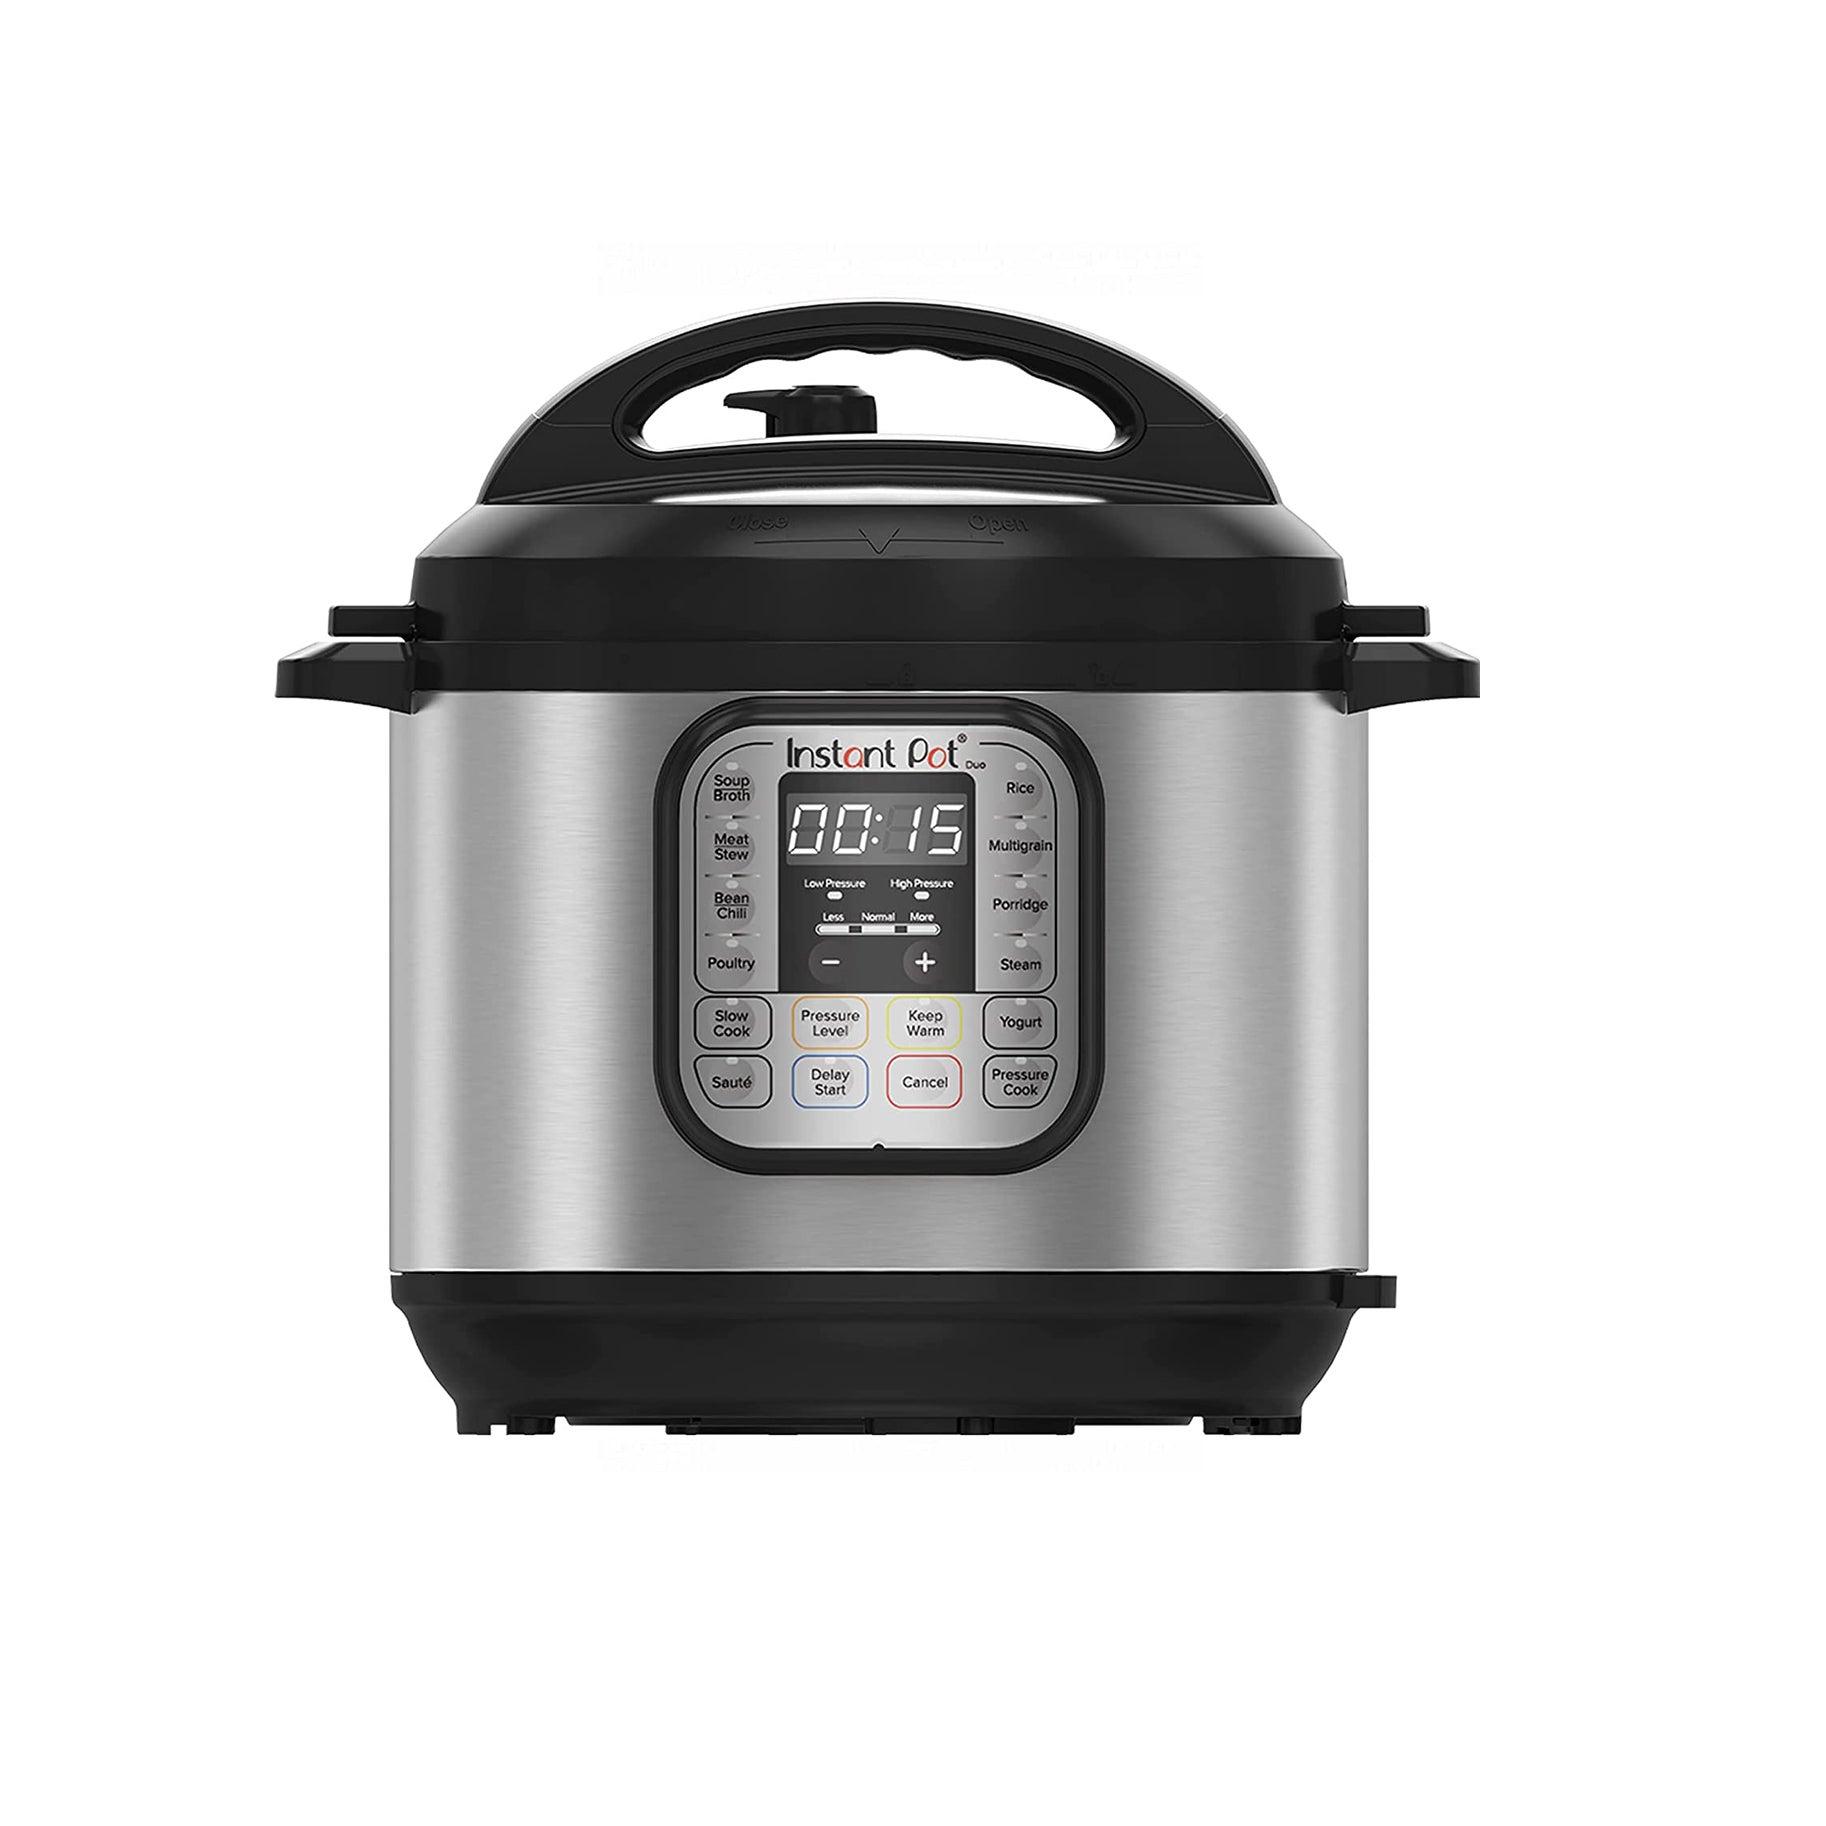 The-Best-Pressure-Cooker-Option-Instant-Pot-Pro-8-Quart